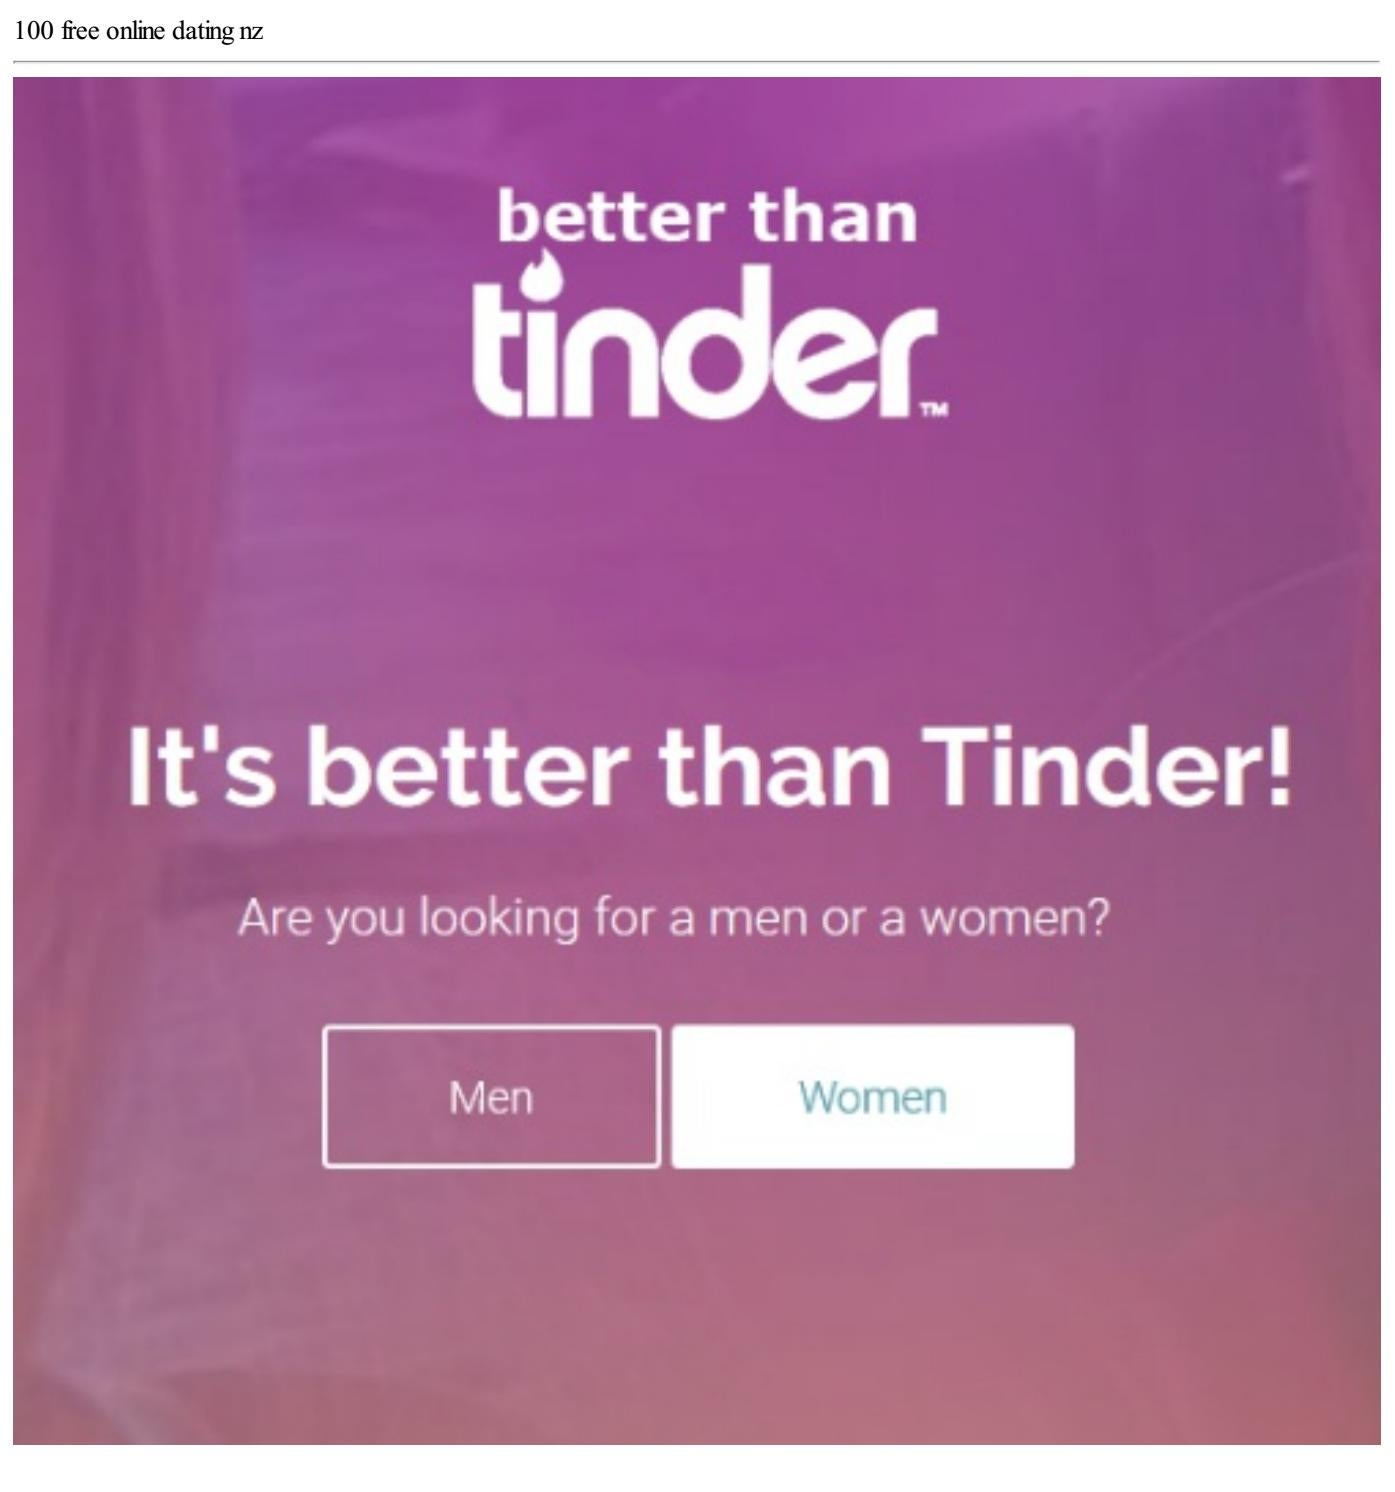 NZ online dating